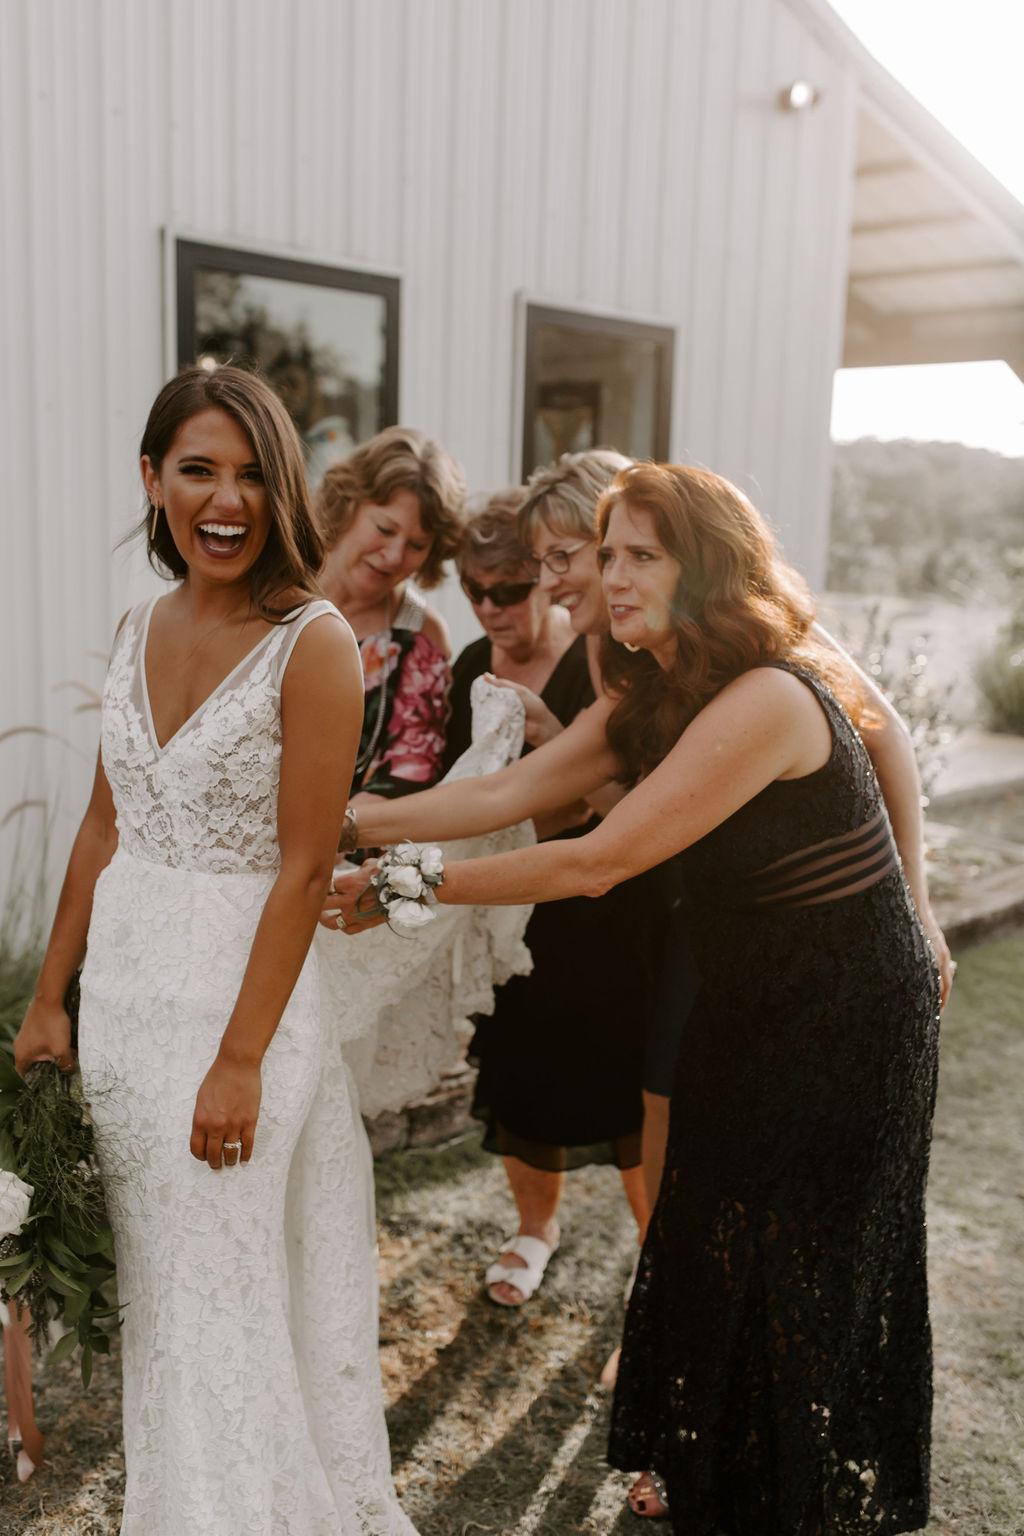 Tulsa White Barn Wedding Venue Outdoor Ceremony 97.jpg